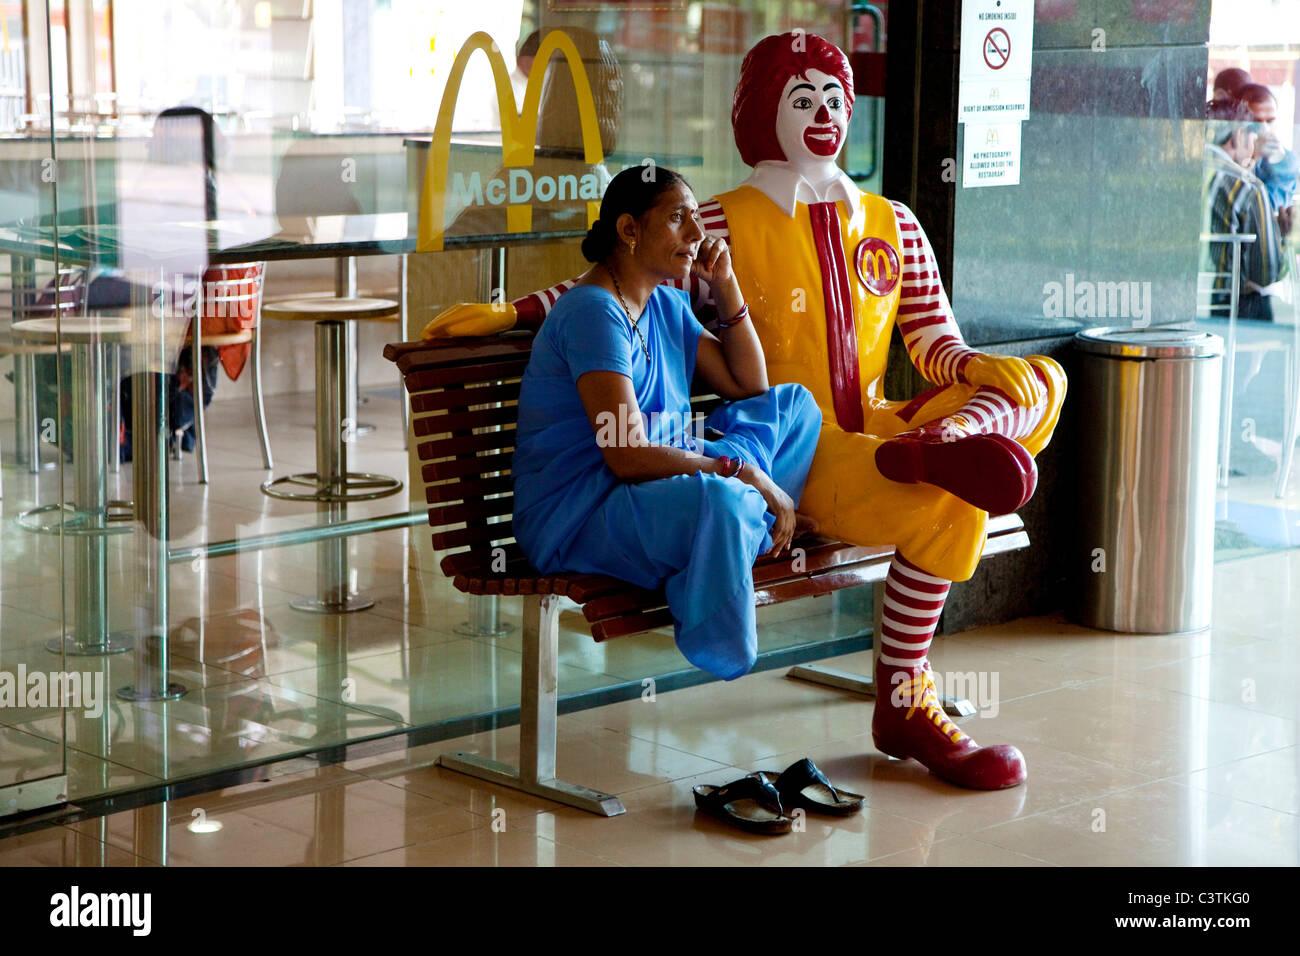 Indian woman sitting on bench at McDonald's fast food restaurant, Varanasi, Uttar Pradesh, India, Asia - Stock Image